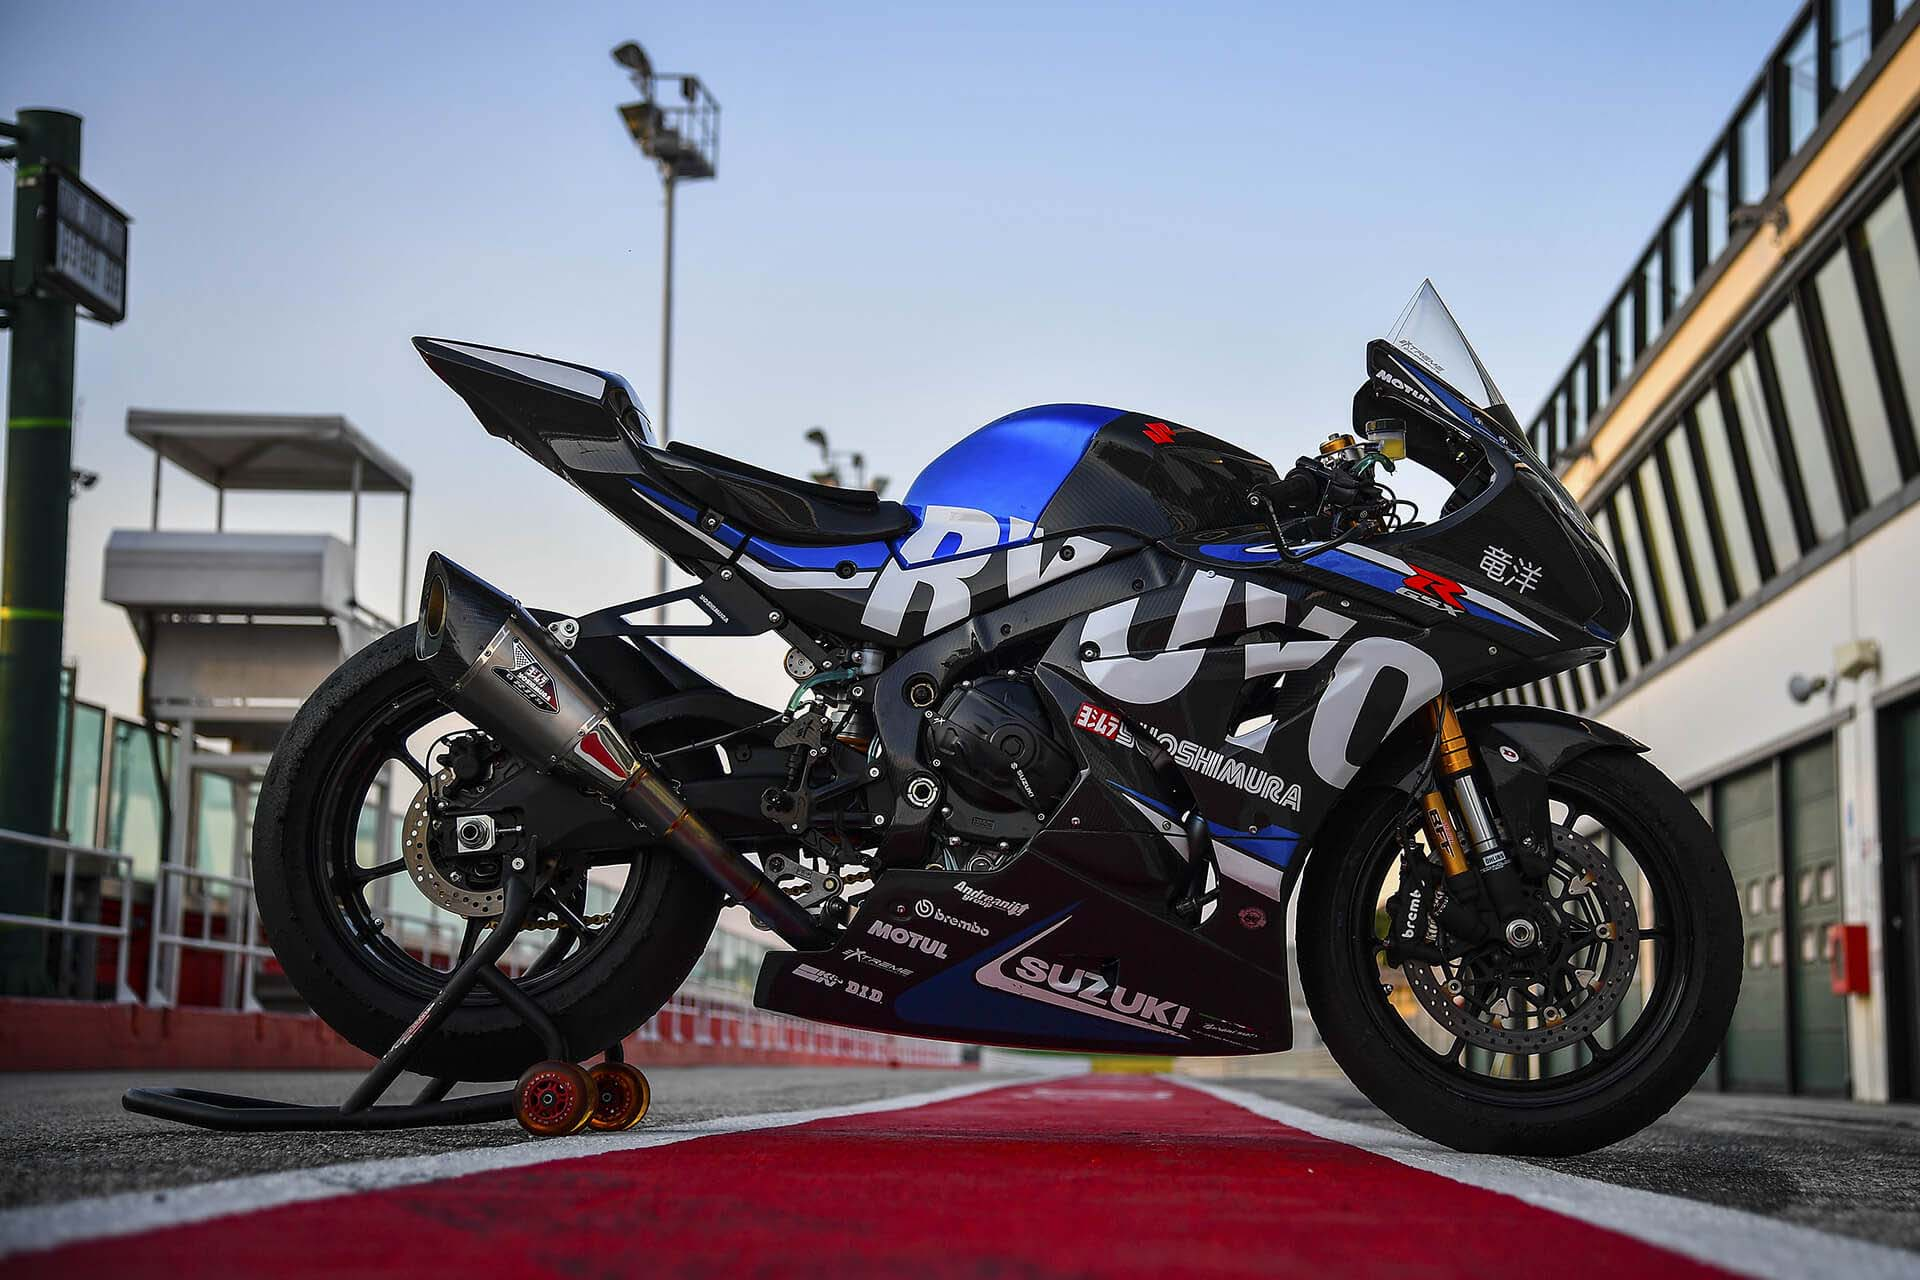 The Suzuki GSX-R1000 Ryuyo, 209hp of Superbike - Asphalt